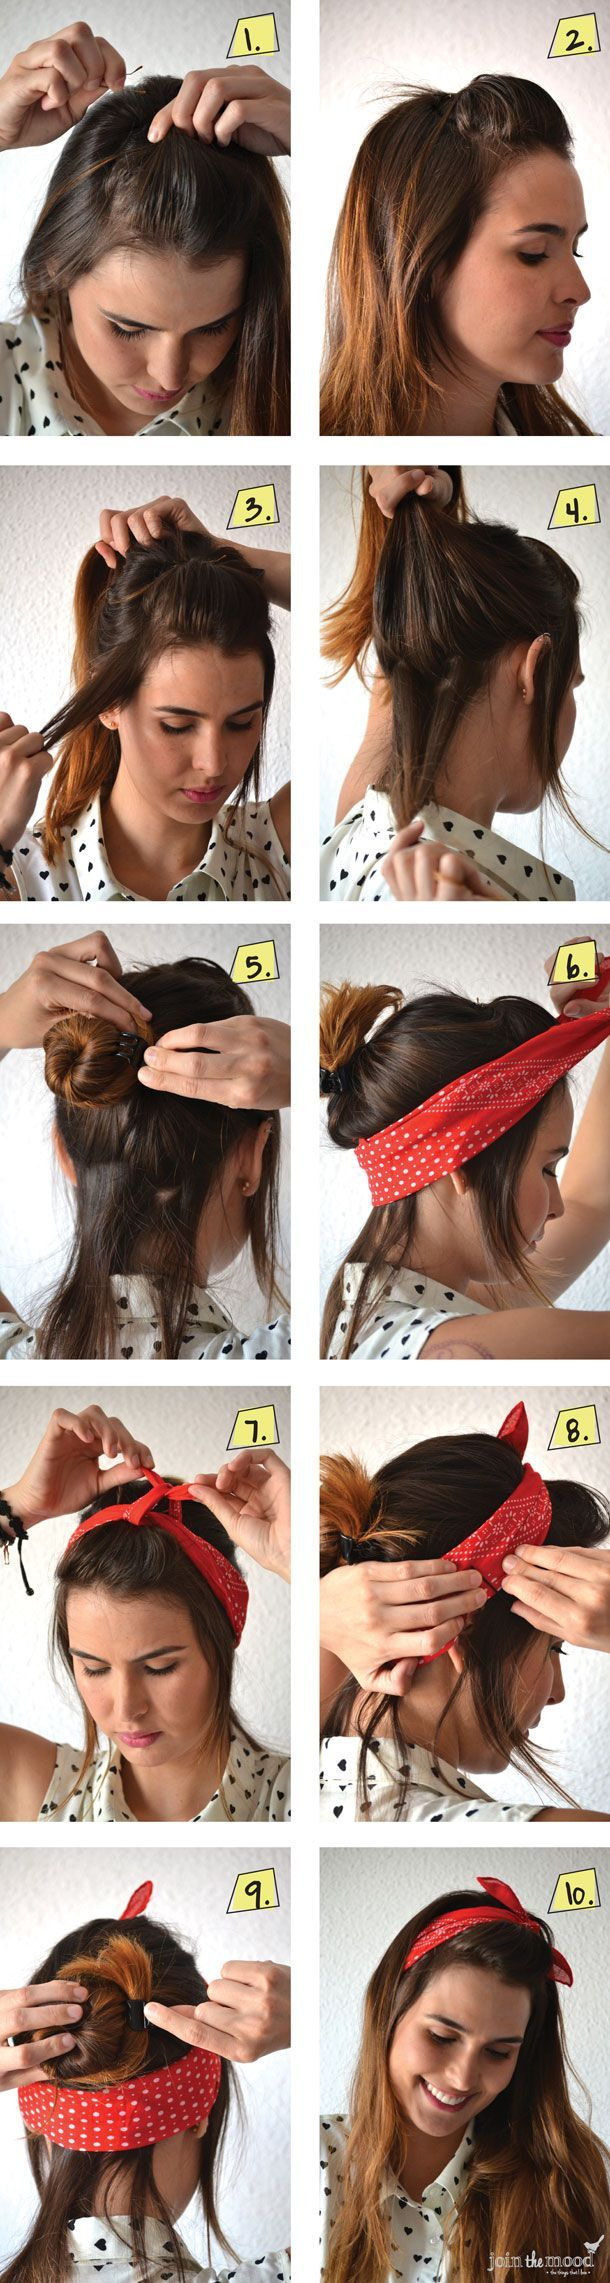 Easy Hairstyle With Bandana -#naturalskincare #healthyskin #skincareproducts #Australianskincare #AqiskinCare